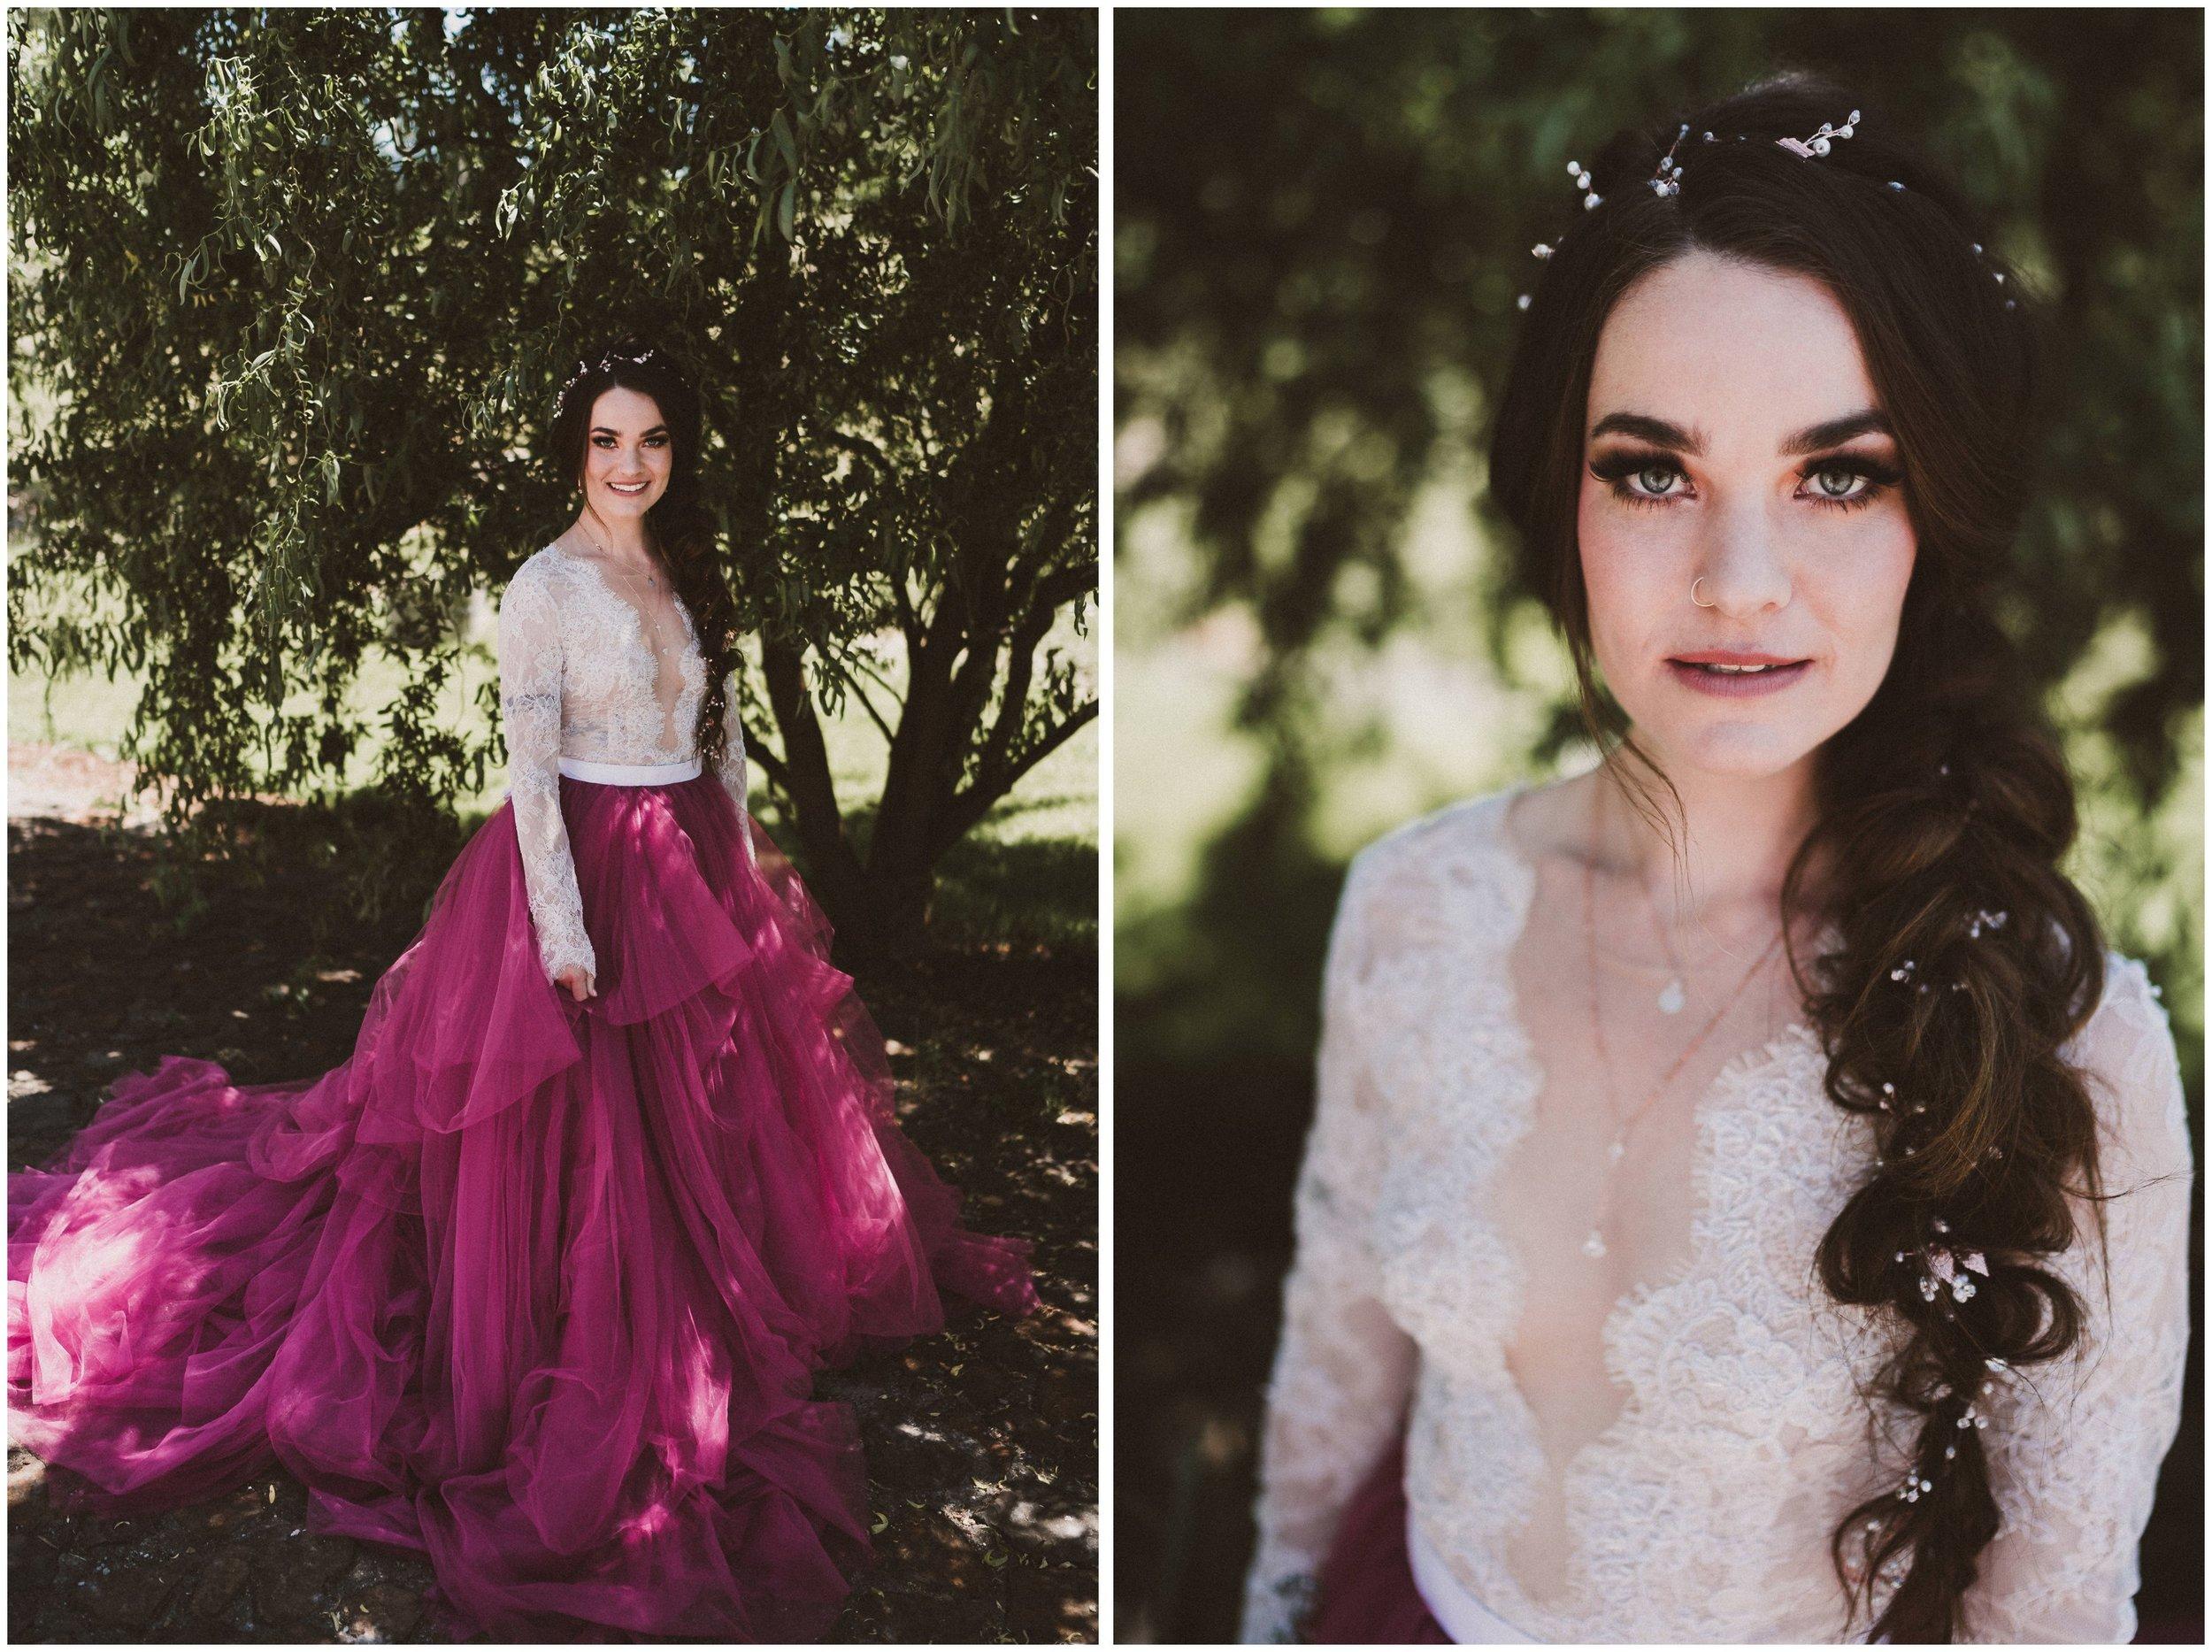 TONY-GAMBINO-PHOTOGRAPHY-BEND-OREGON-WEDDING-SHOOT-000_1506 bridal portraits.jpg